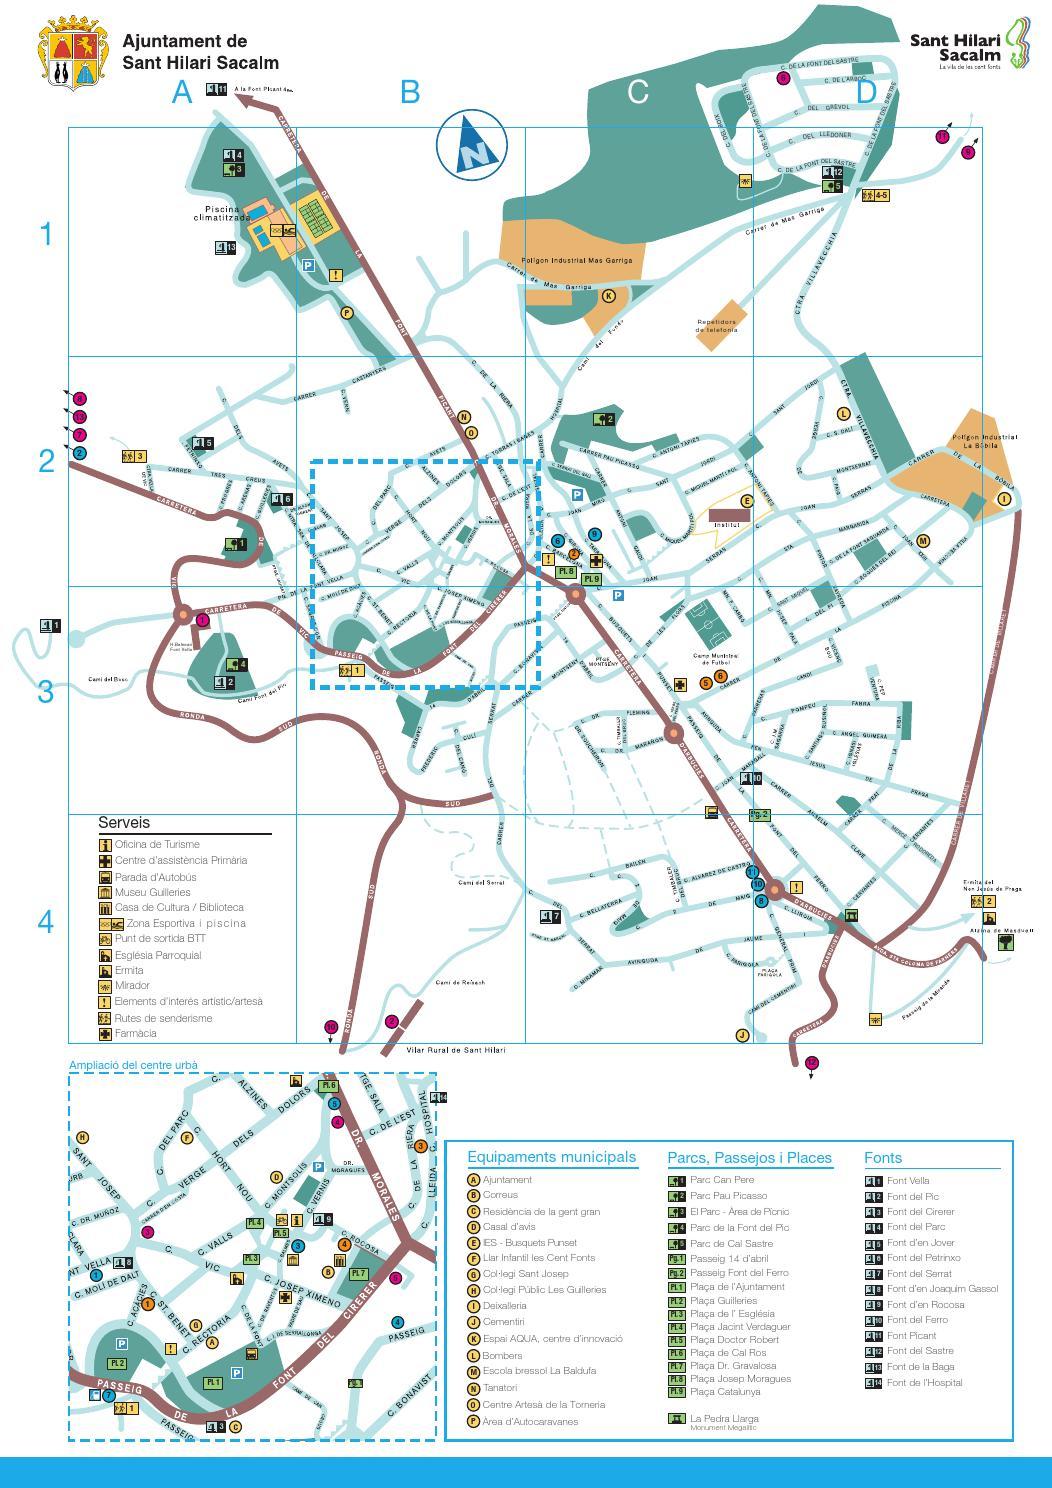 Sant Hilari Sacalm Mapa.Mapa De La Vila De Sant Hilari Sacalm By Narcis